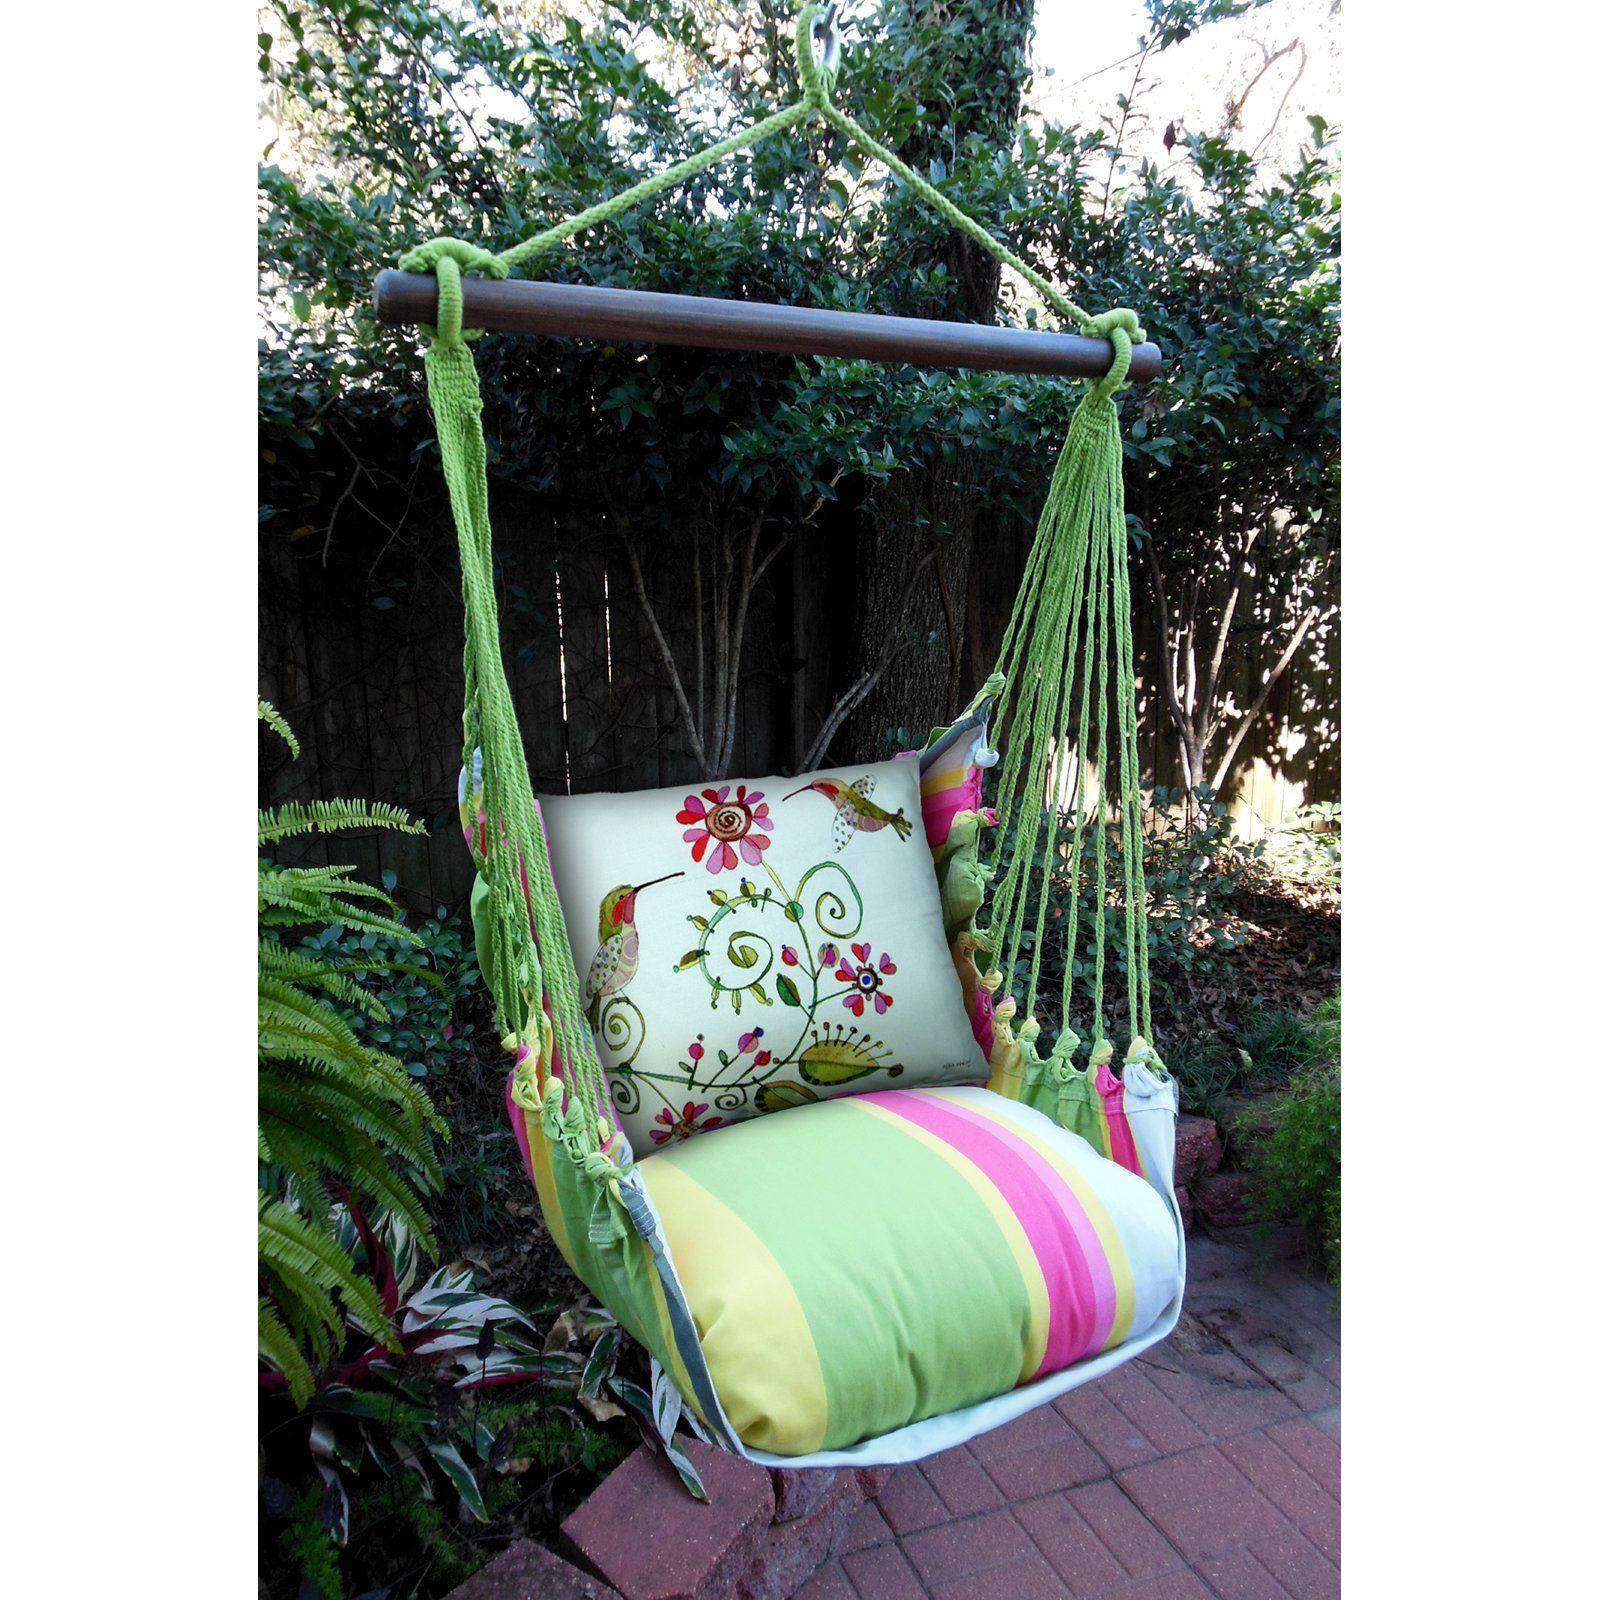 Outdoor Magnolia Casual Hummingbirds Hammock Chair Pillow Set